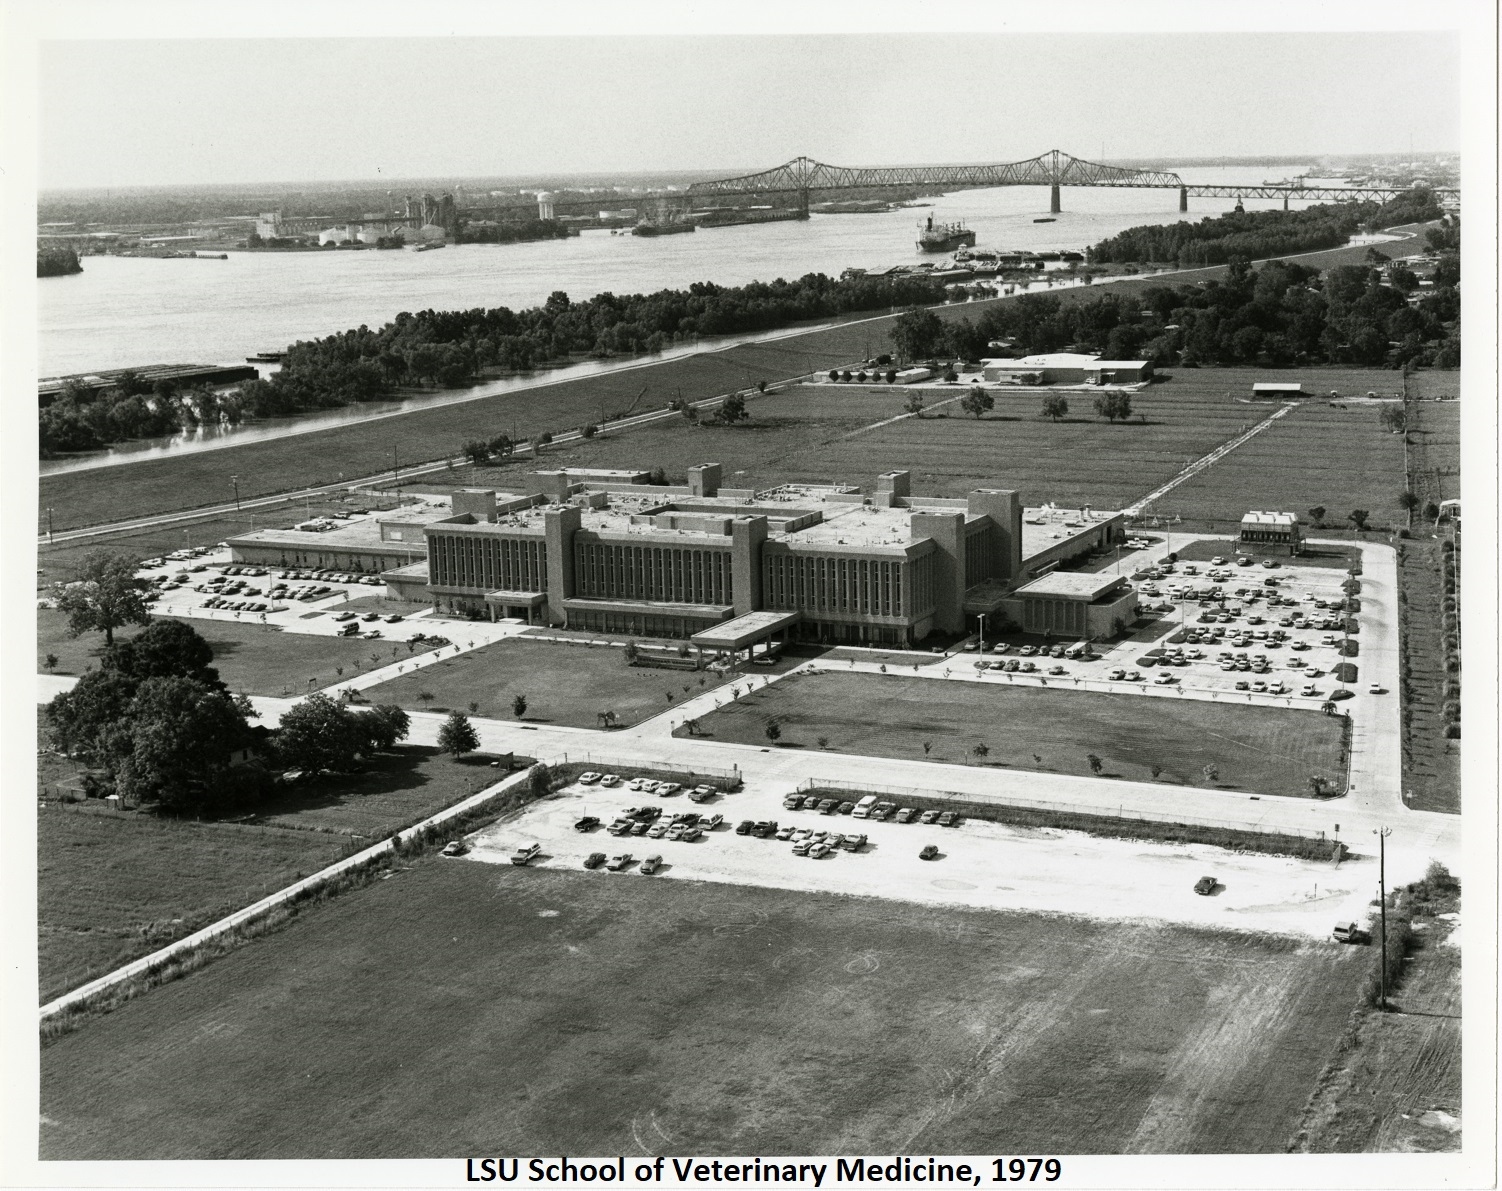 LSU School of Veterinary Medicine, 1979